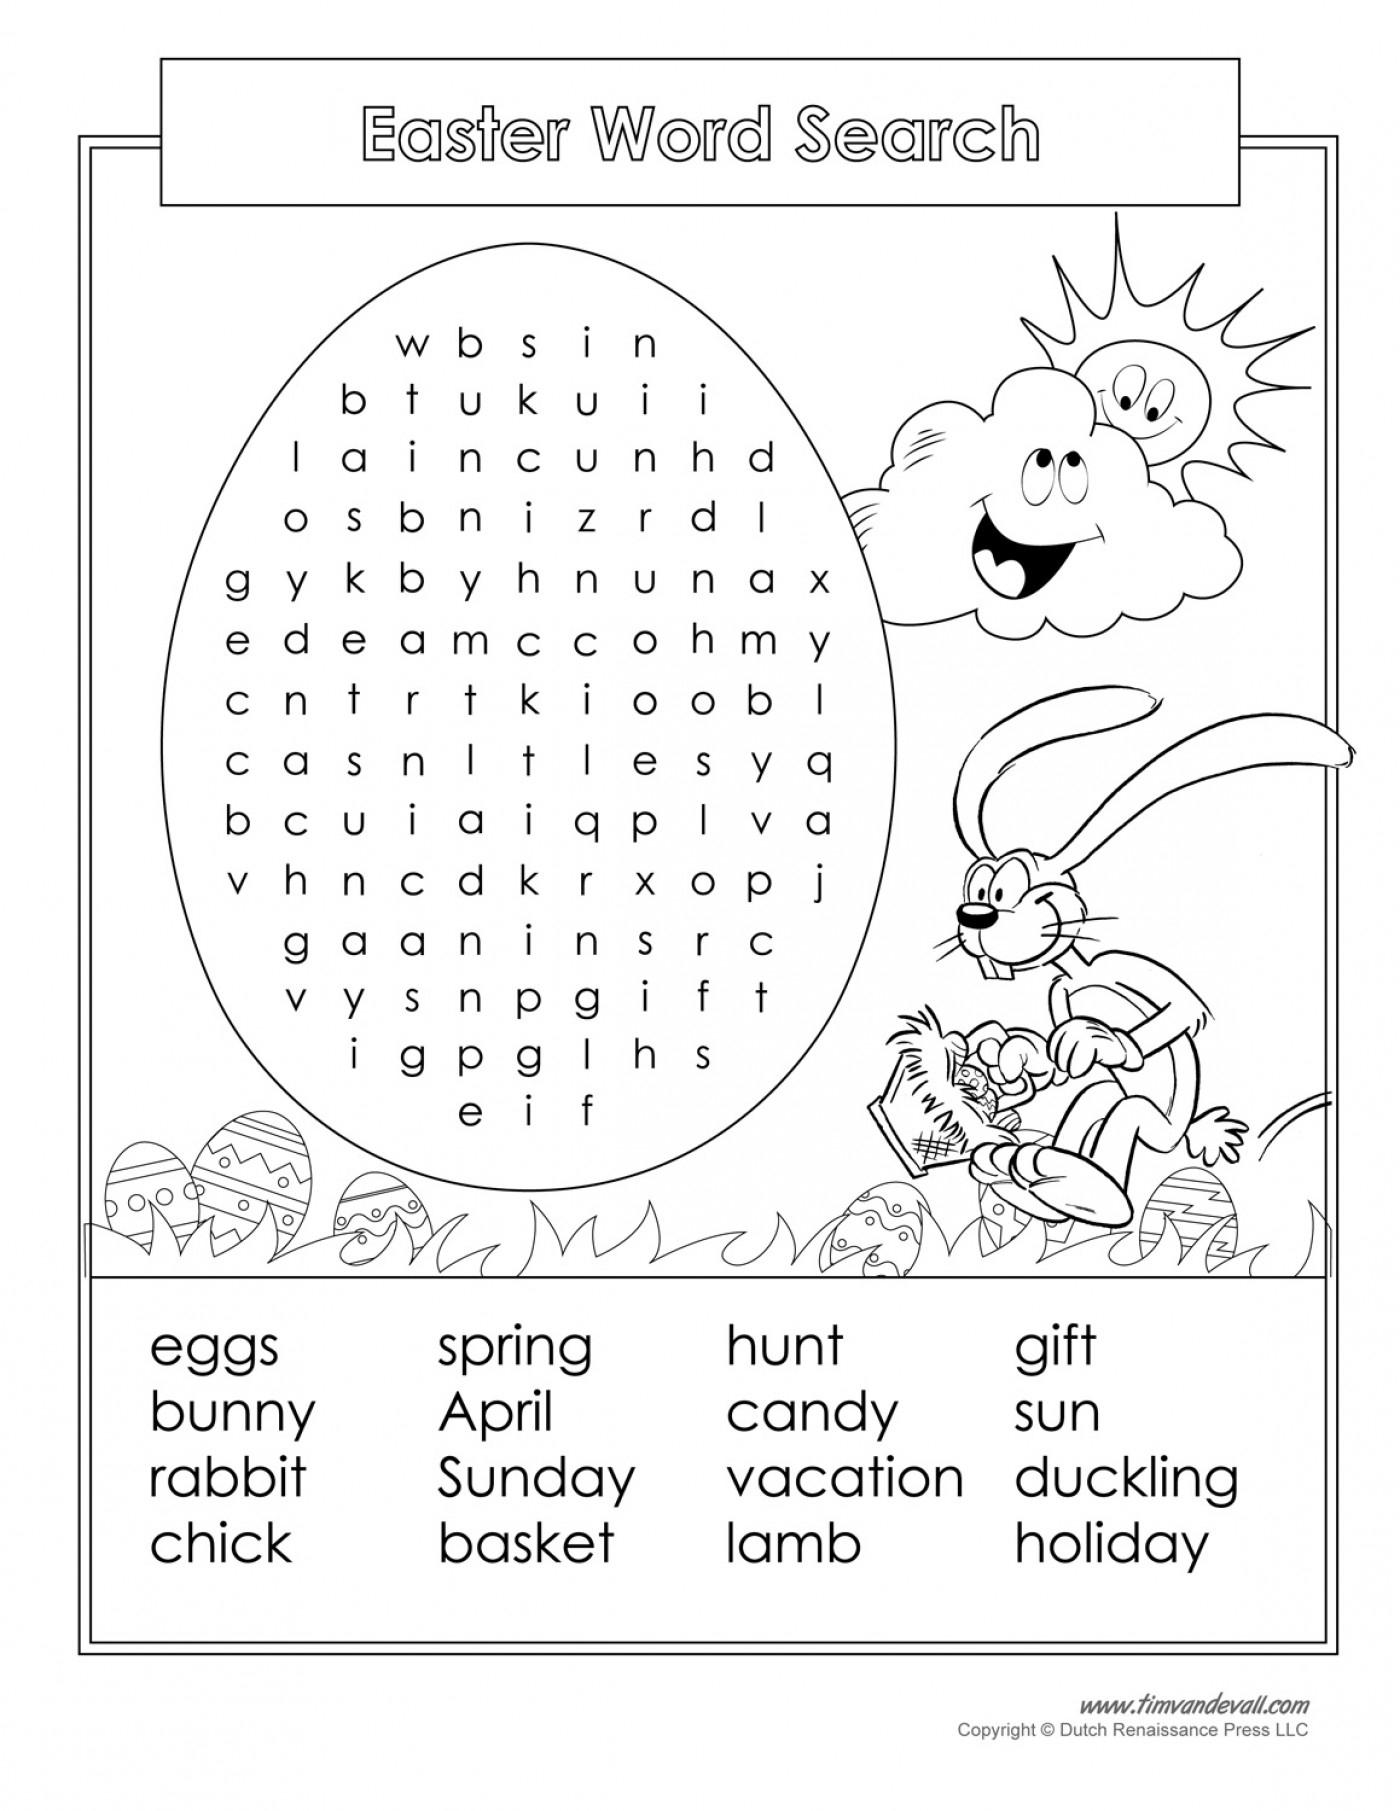 Easter Crossword Puzzle Printable Crosswords Free Word - Free - Printable Crossword Spring